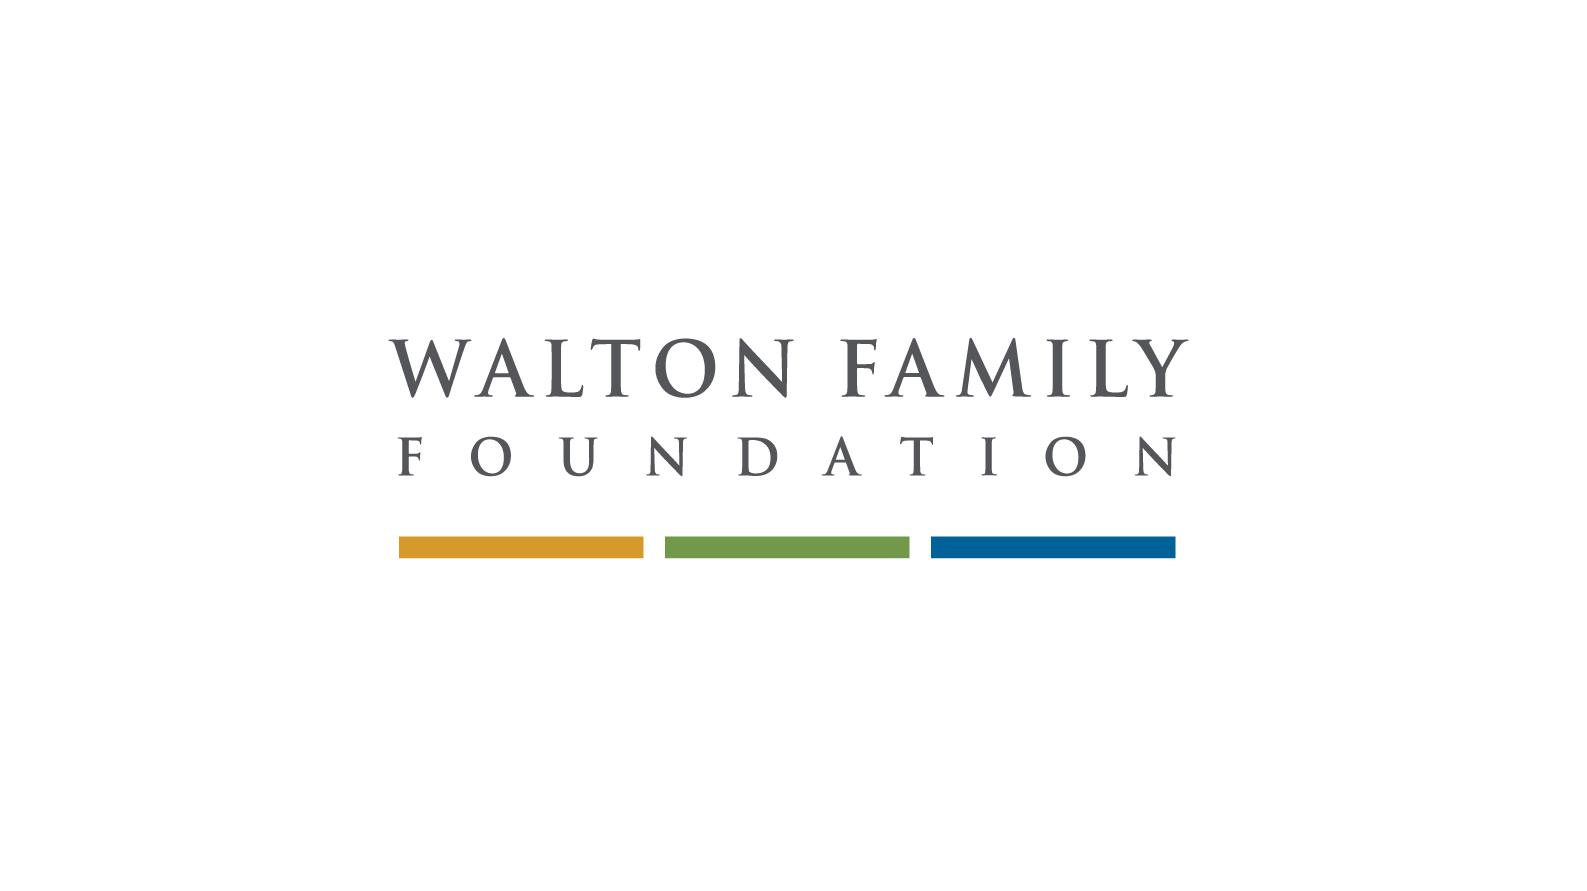 walton family_1462224025925.jpg